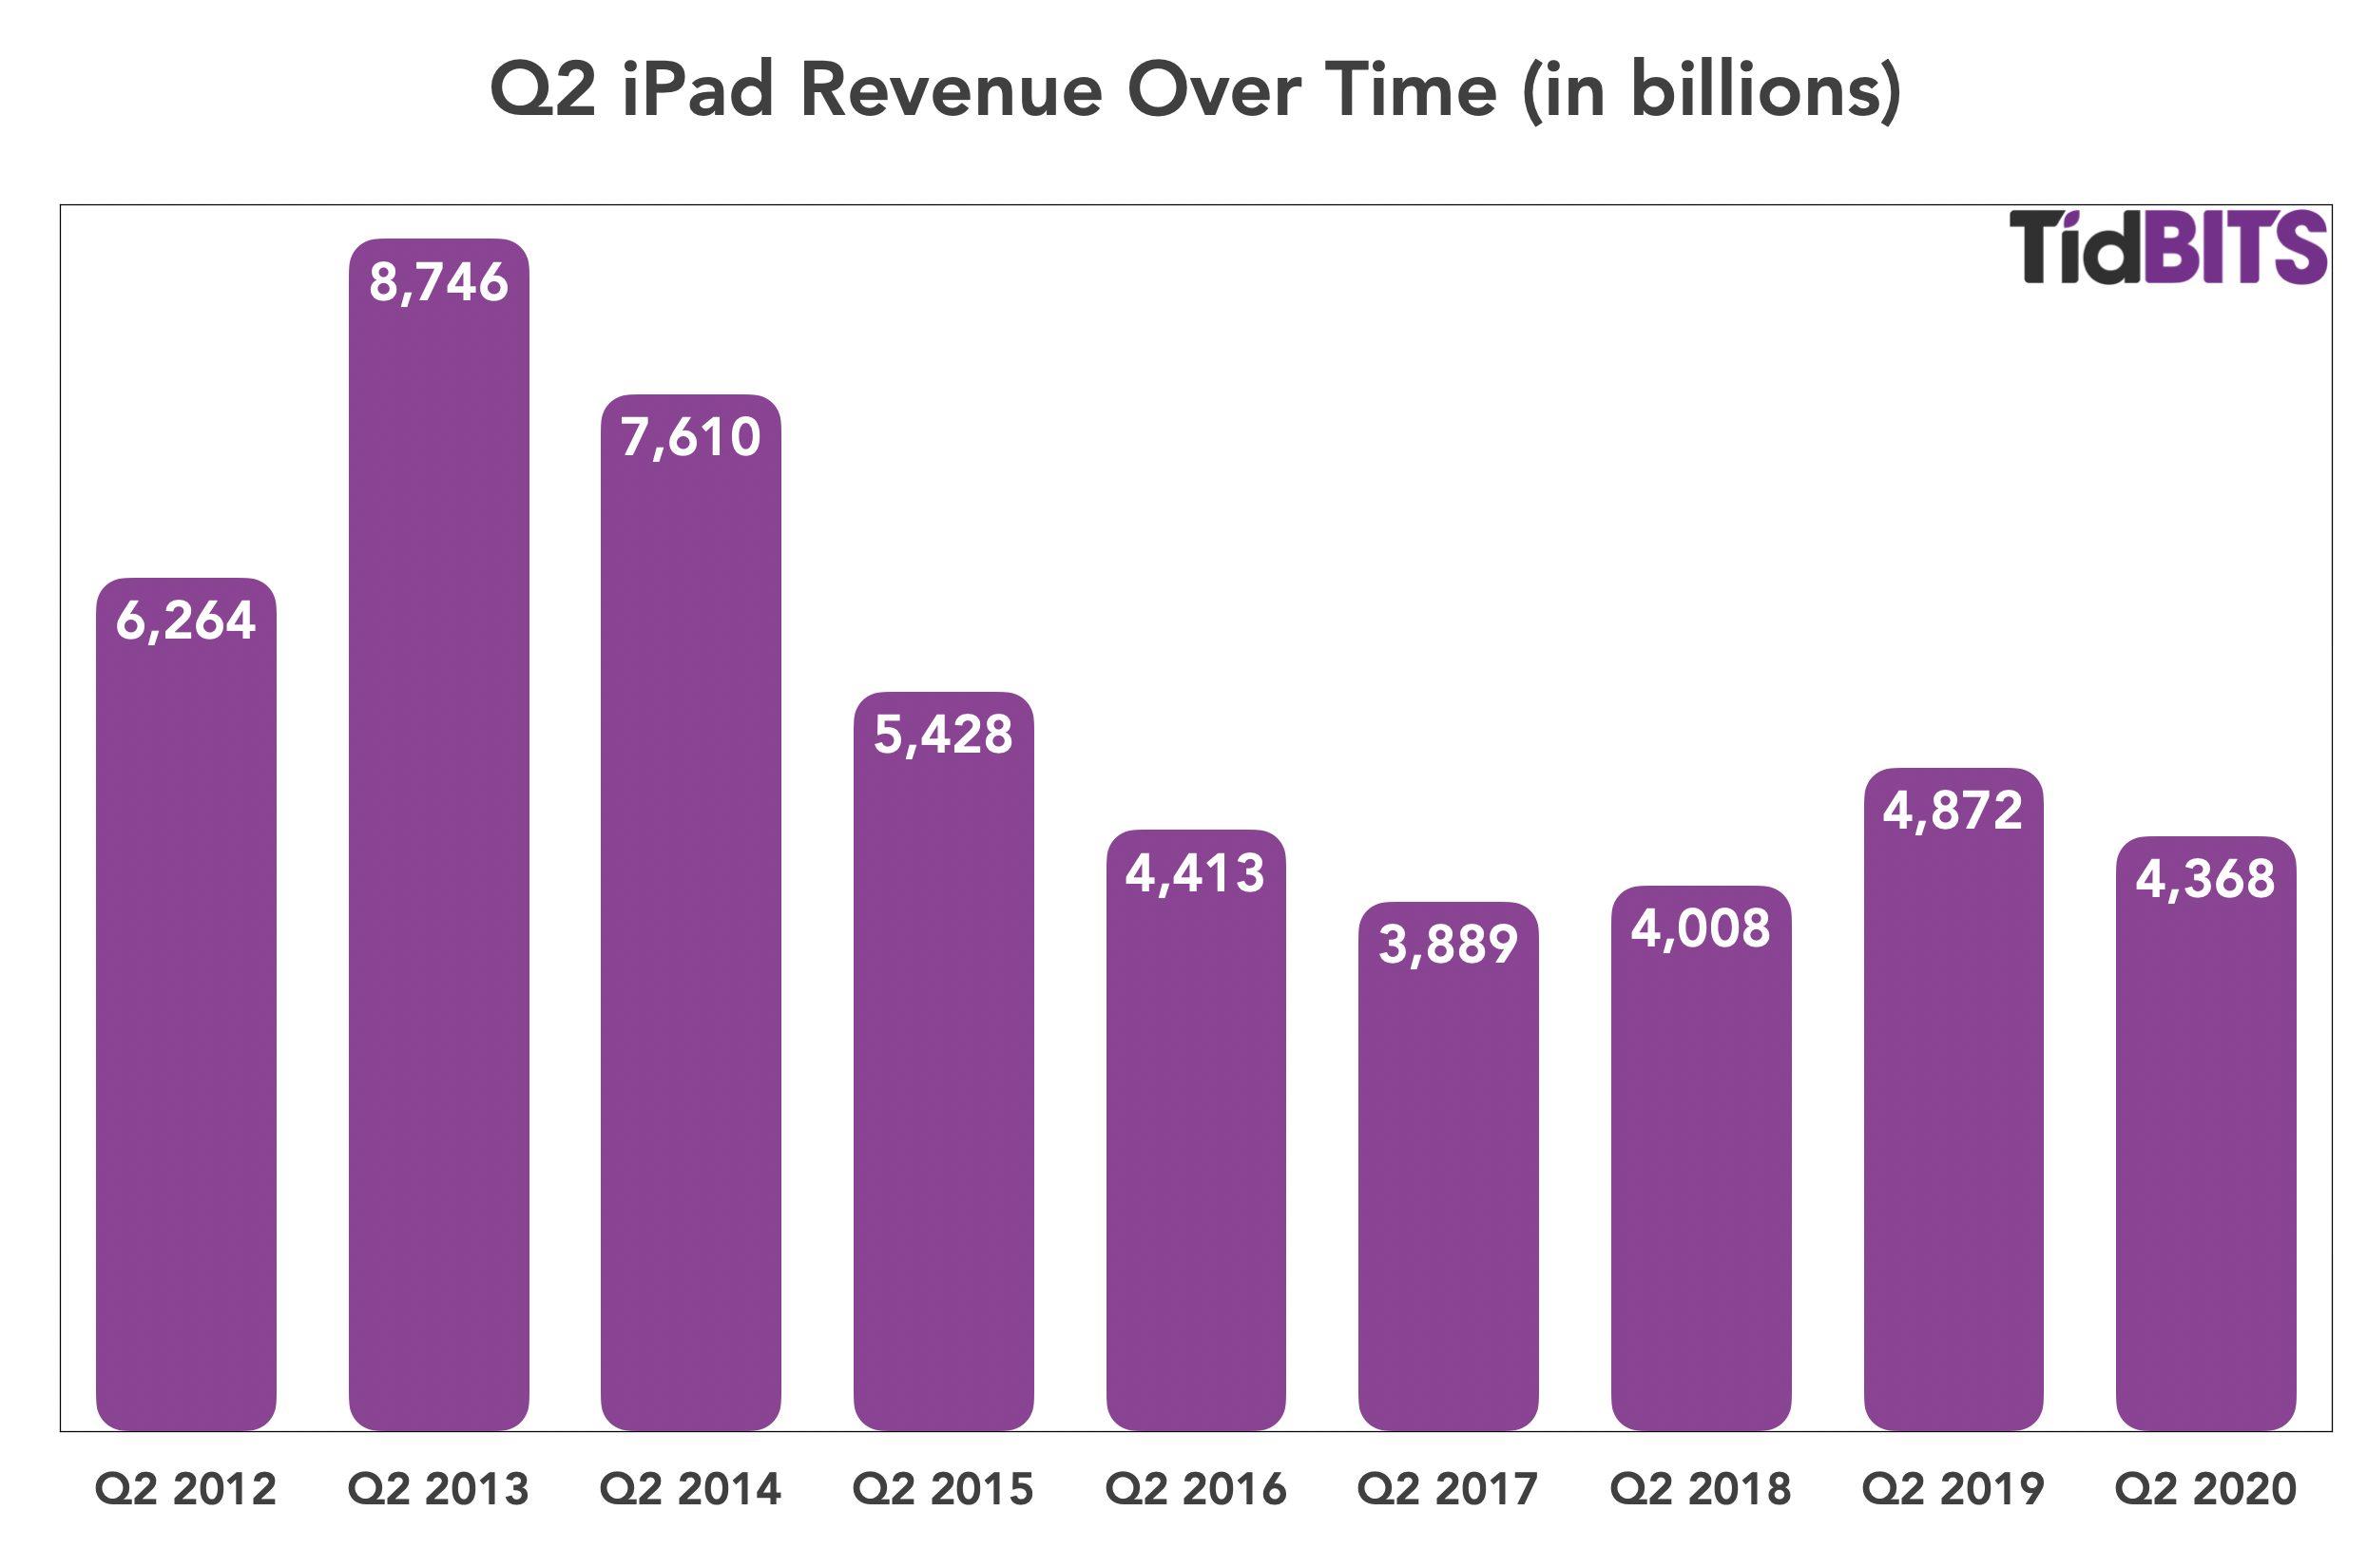 Apple iPad Q2 2020